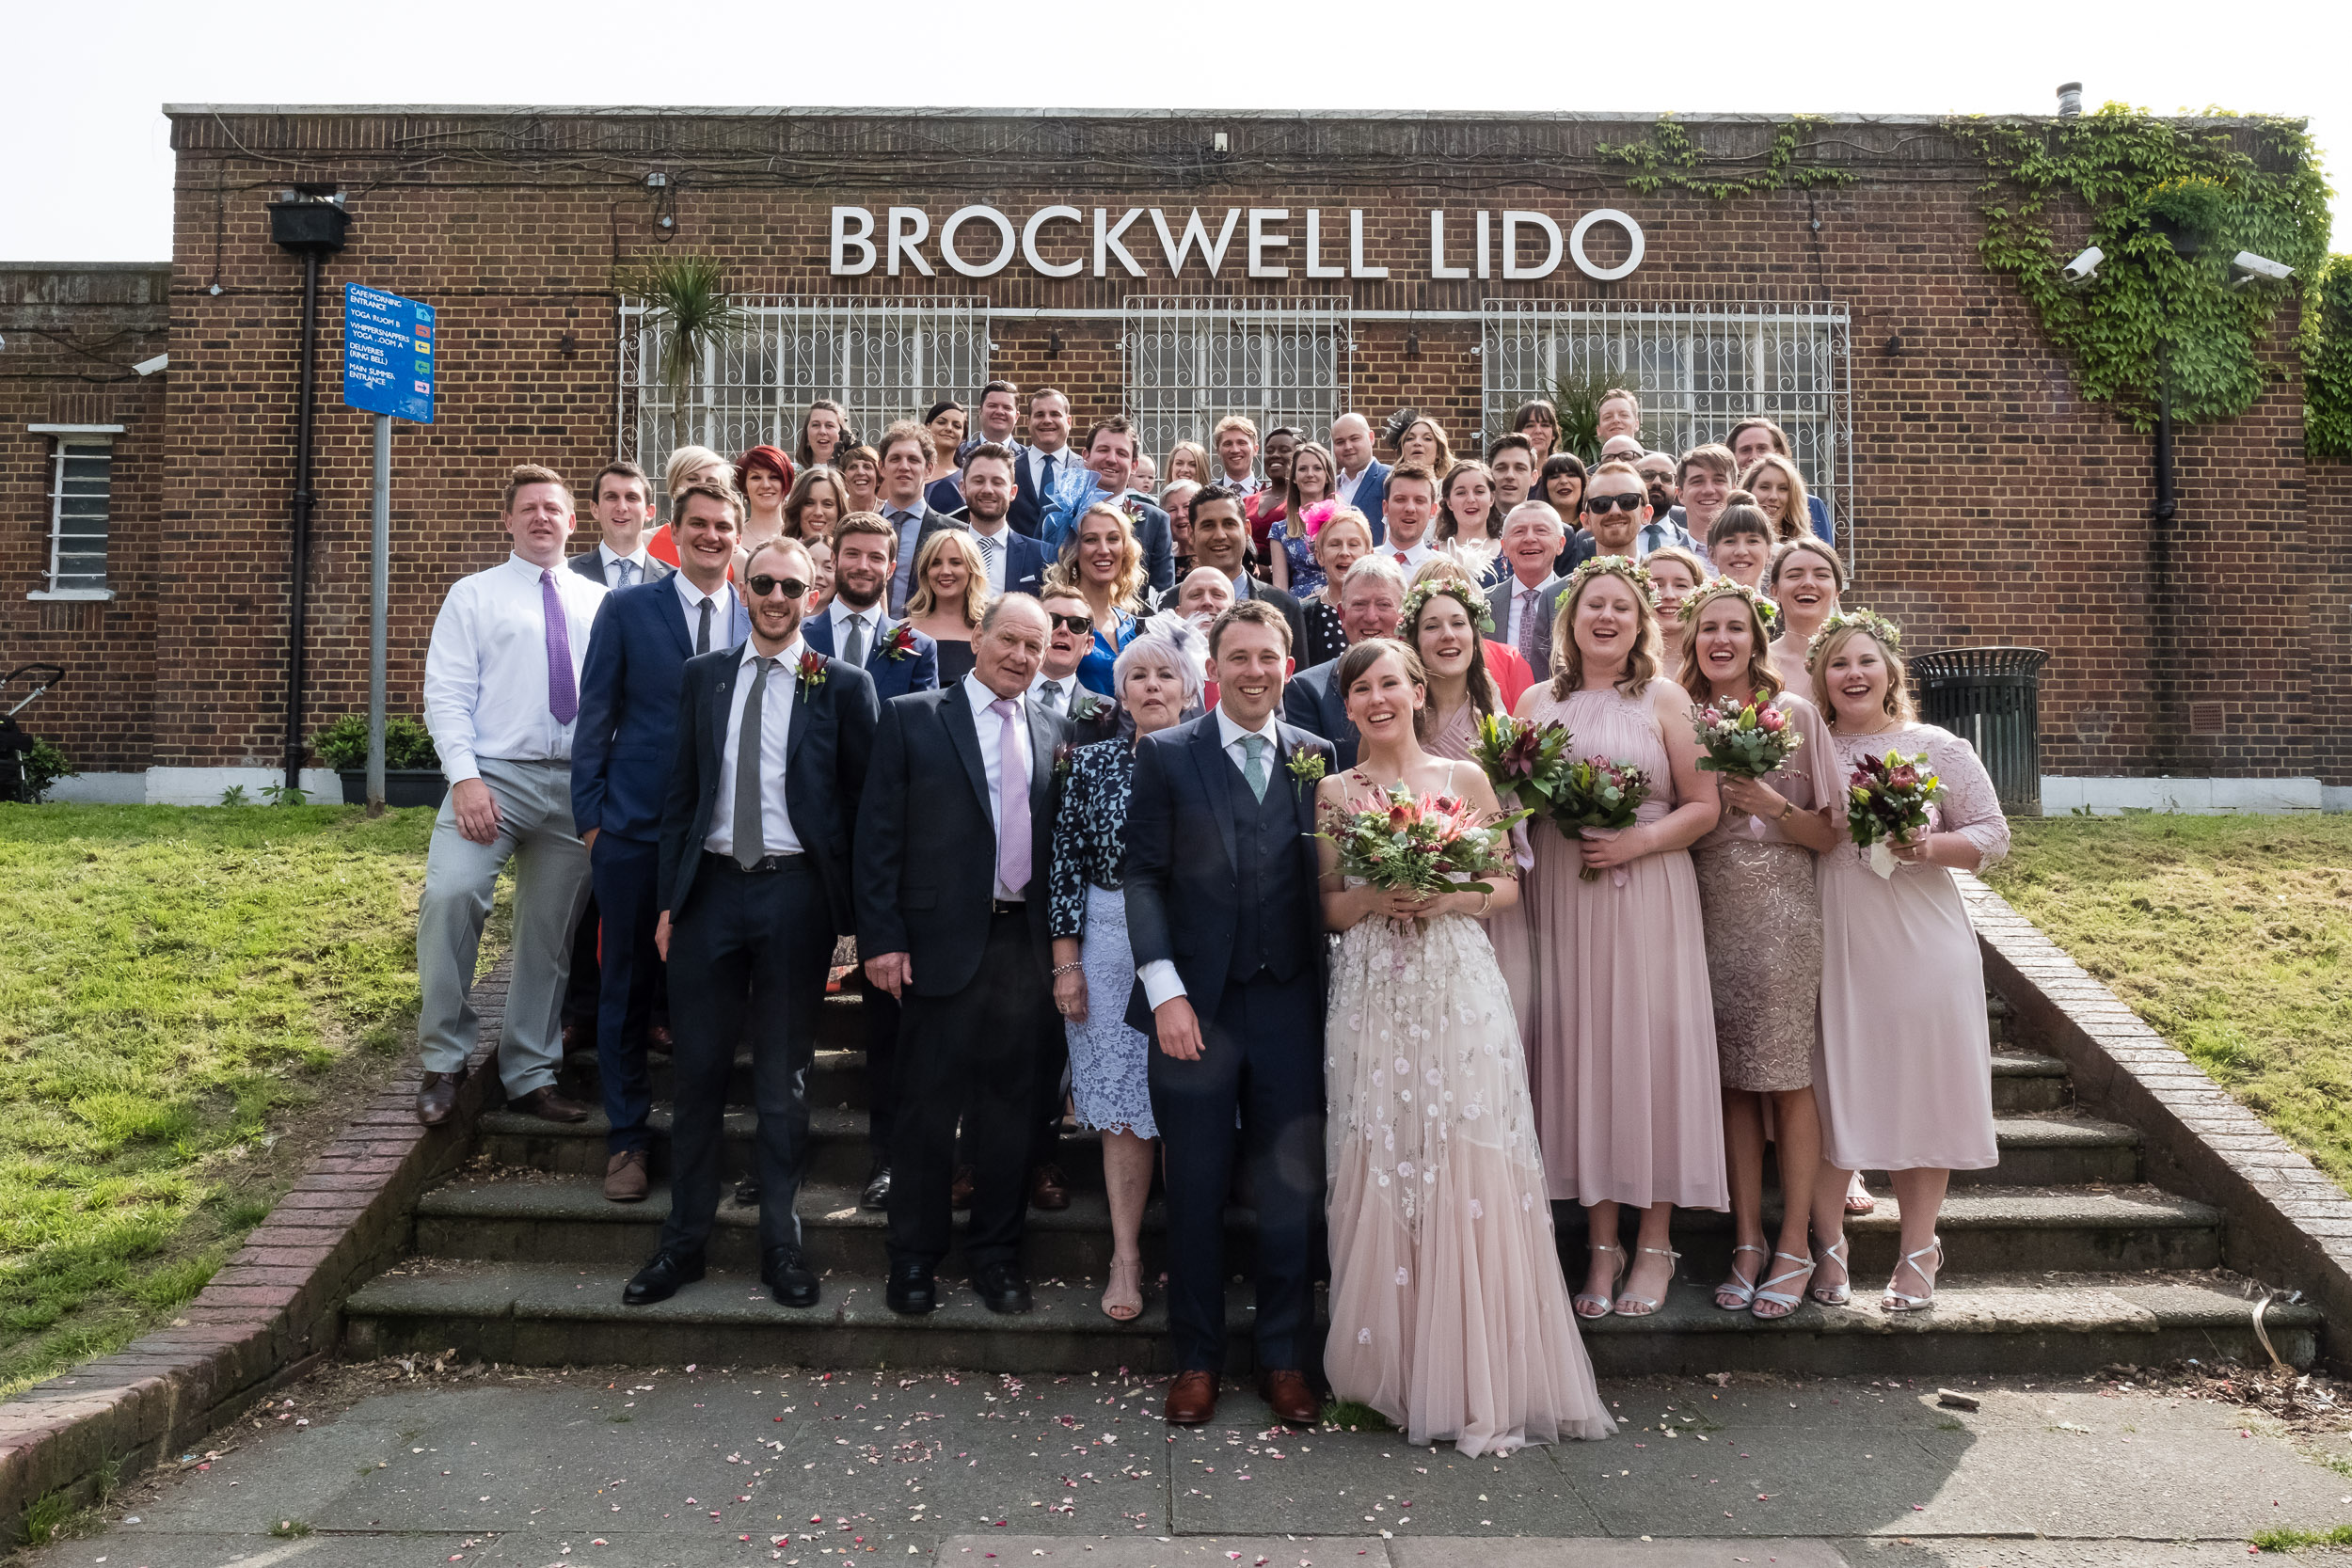 brockwell-lido-brixton-herne-hill-wedding-221.jpg